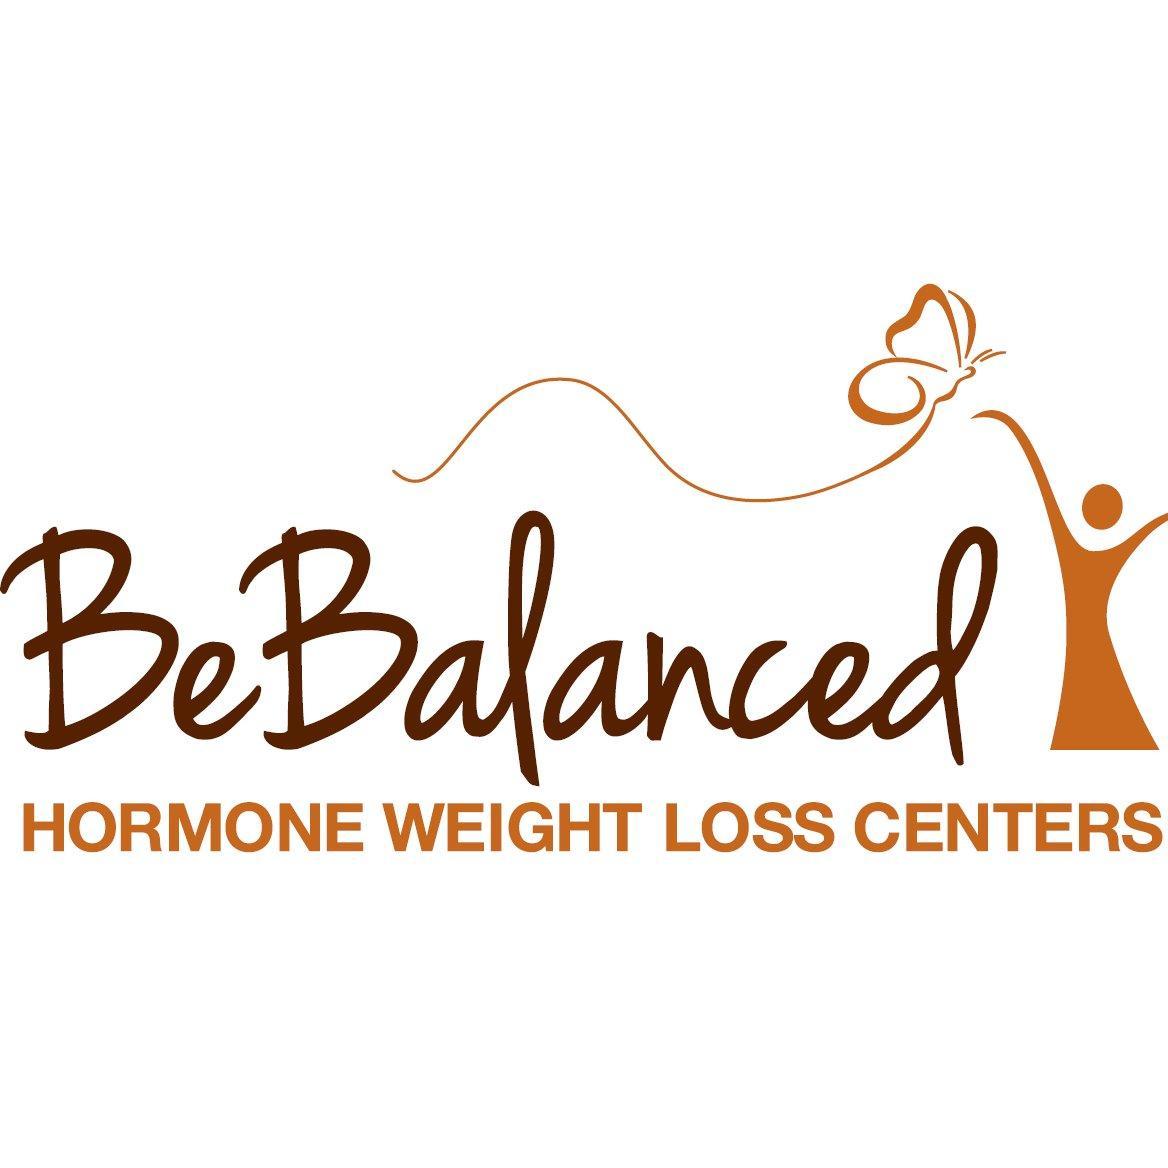 BeBalanced Hormone Weight Loss Centers - Murrysville